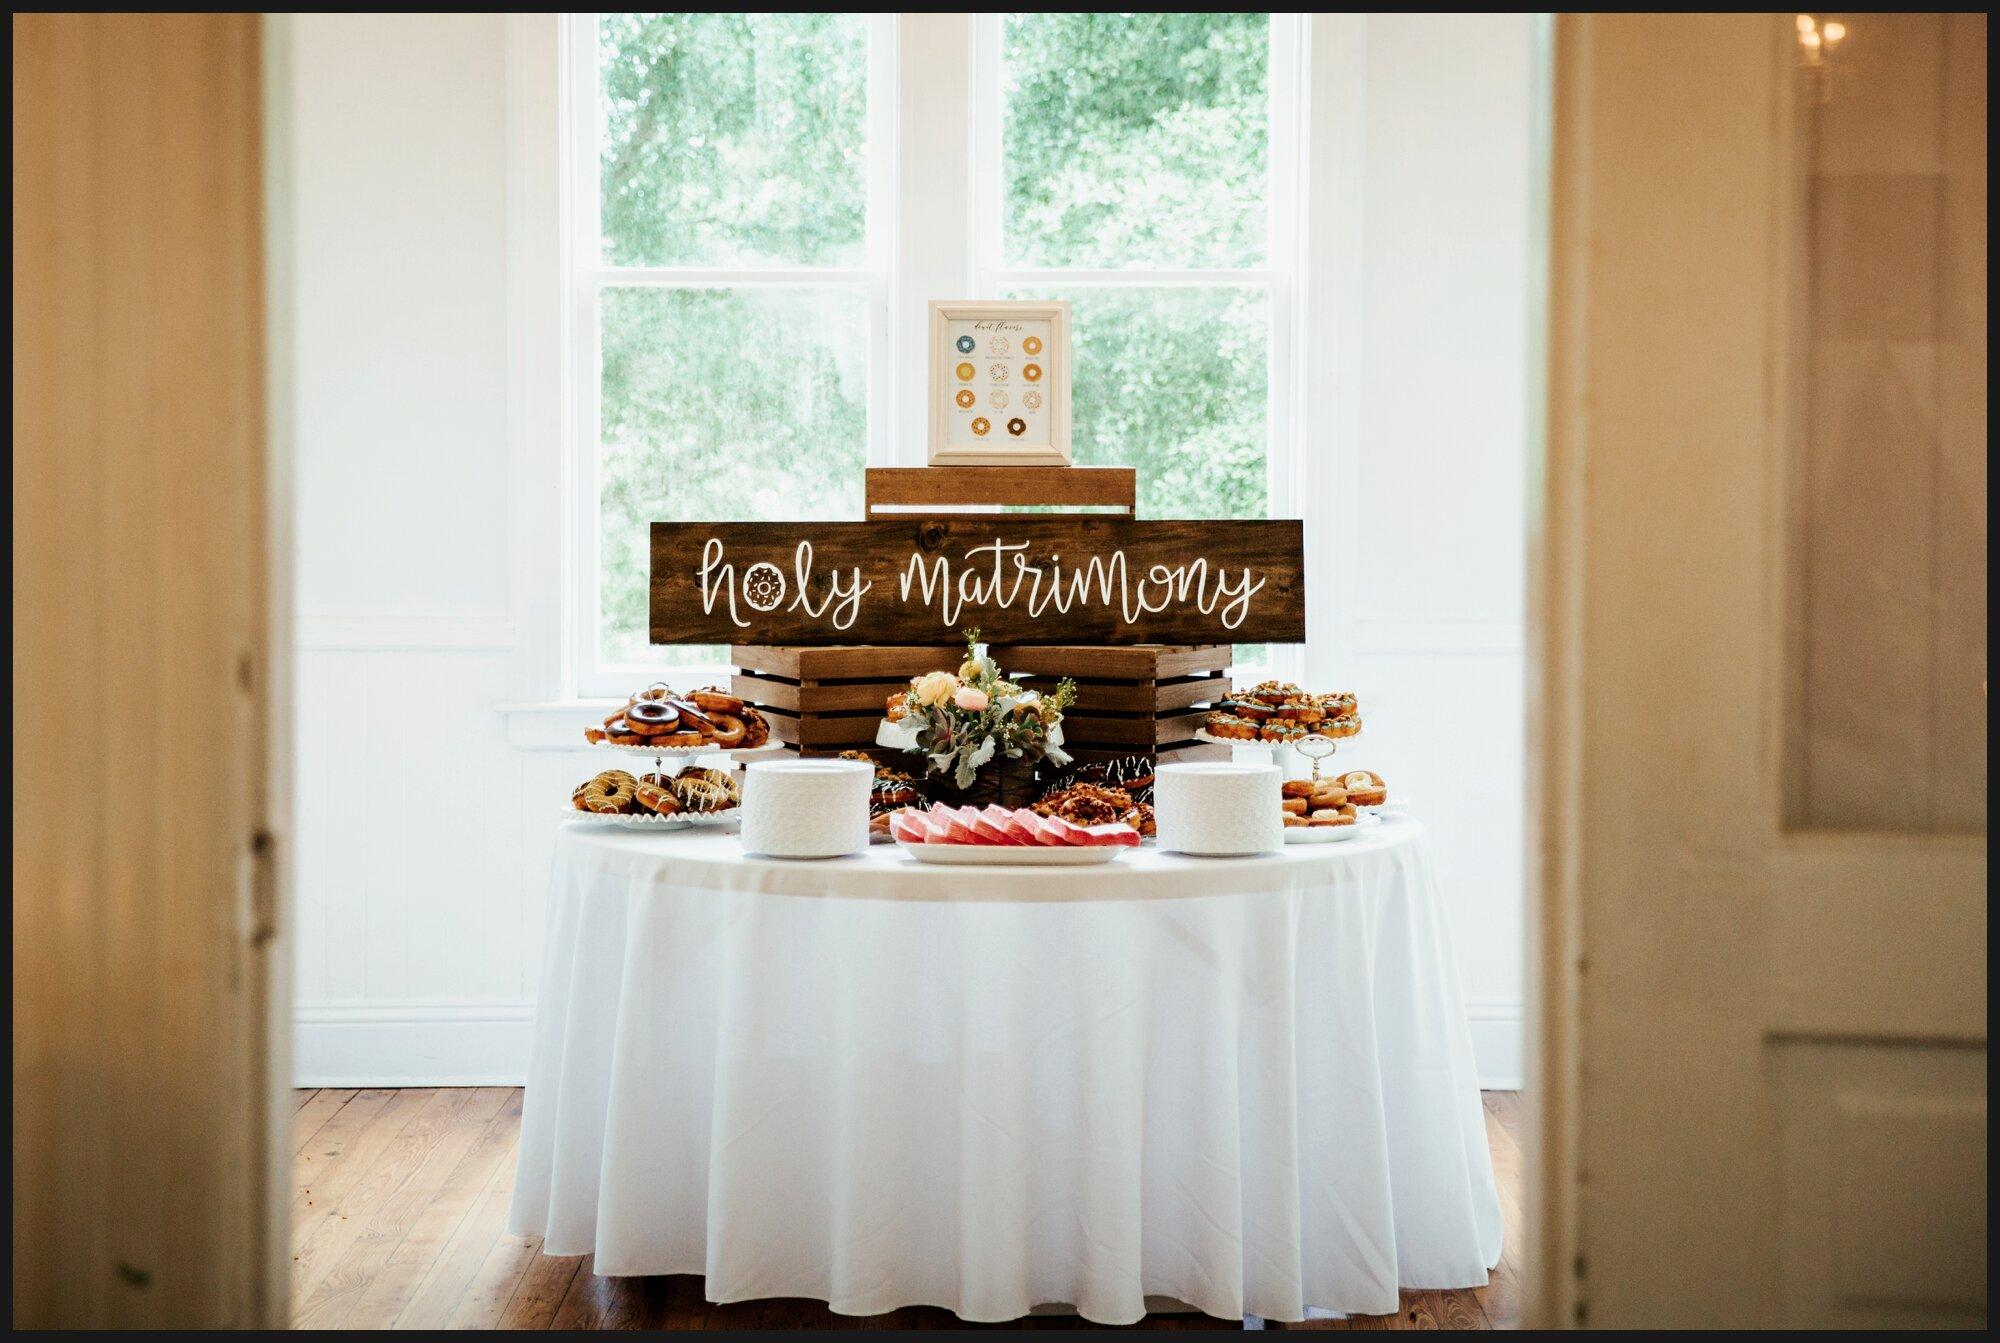 Orlando-Wedding-Photographer-destination-wedding-photographer-florida-wedding-photographer-hawaii-wedding-photographer_0688.jpg